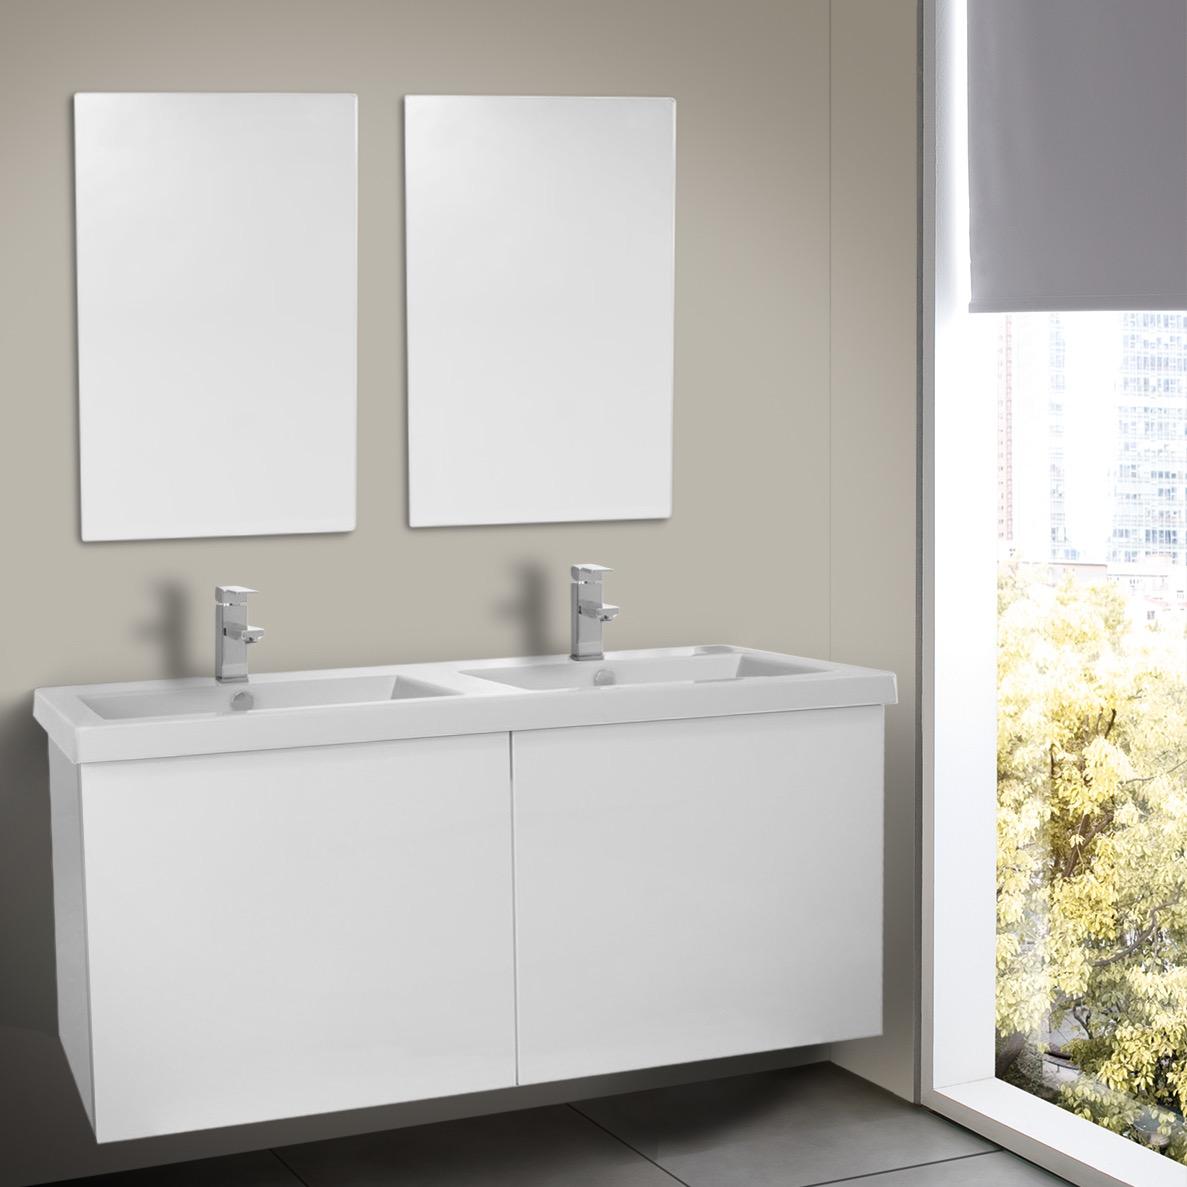 Inch Glossy White Double Bathroom Vanity With Ceramic Sink - 47 bathroom vanity sink cabinet